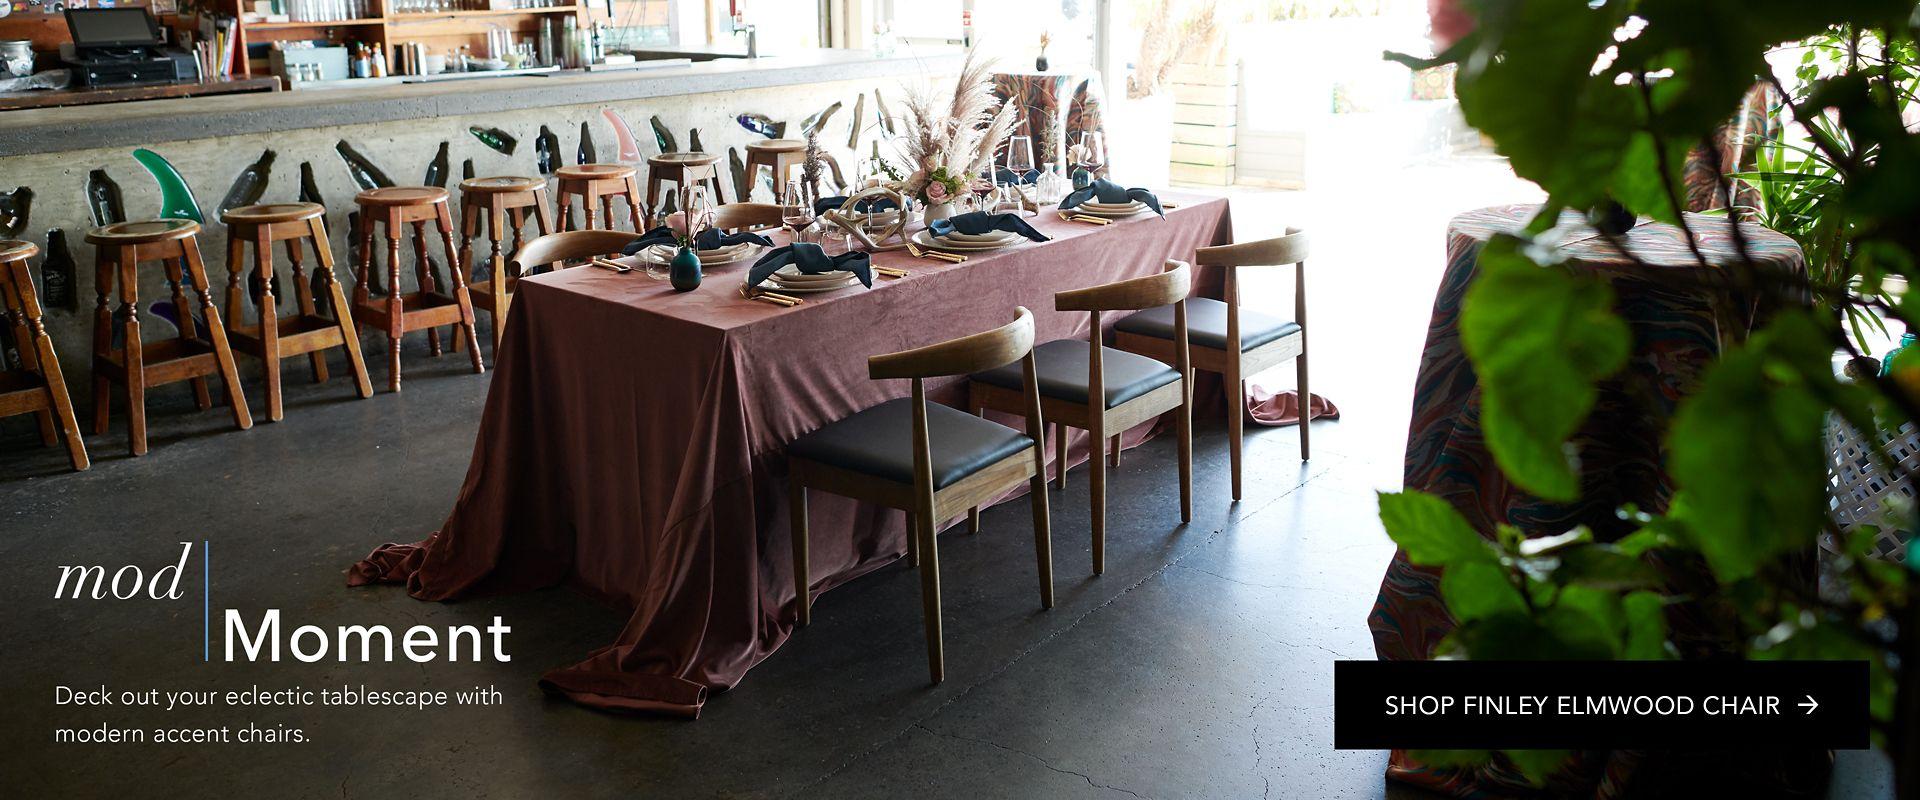 Surprising Home Party Rental Ltd Andrewgaddart Wooden Chair Designs For Living Room Andrewgaddartcom